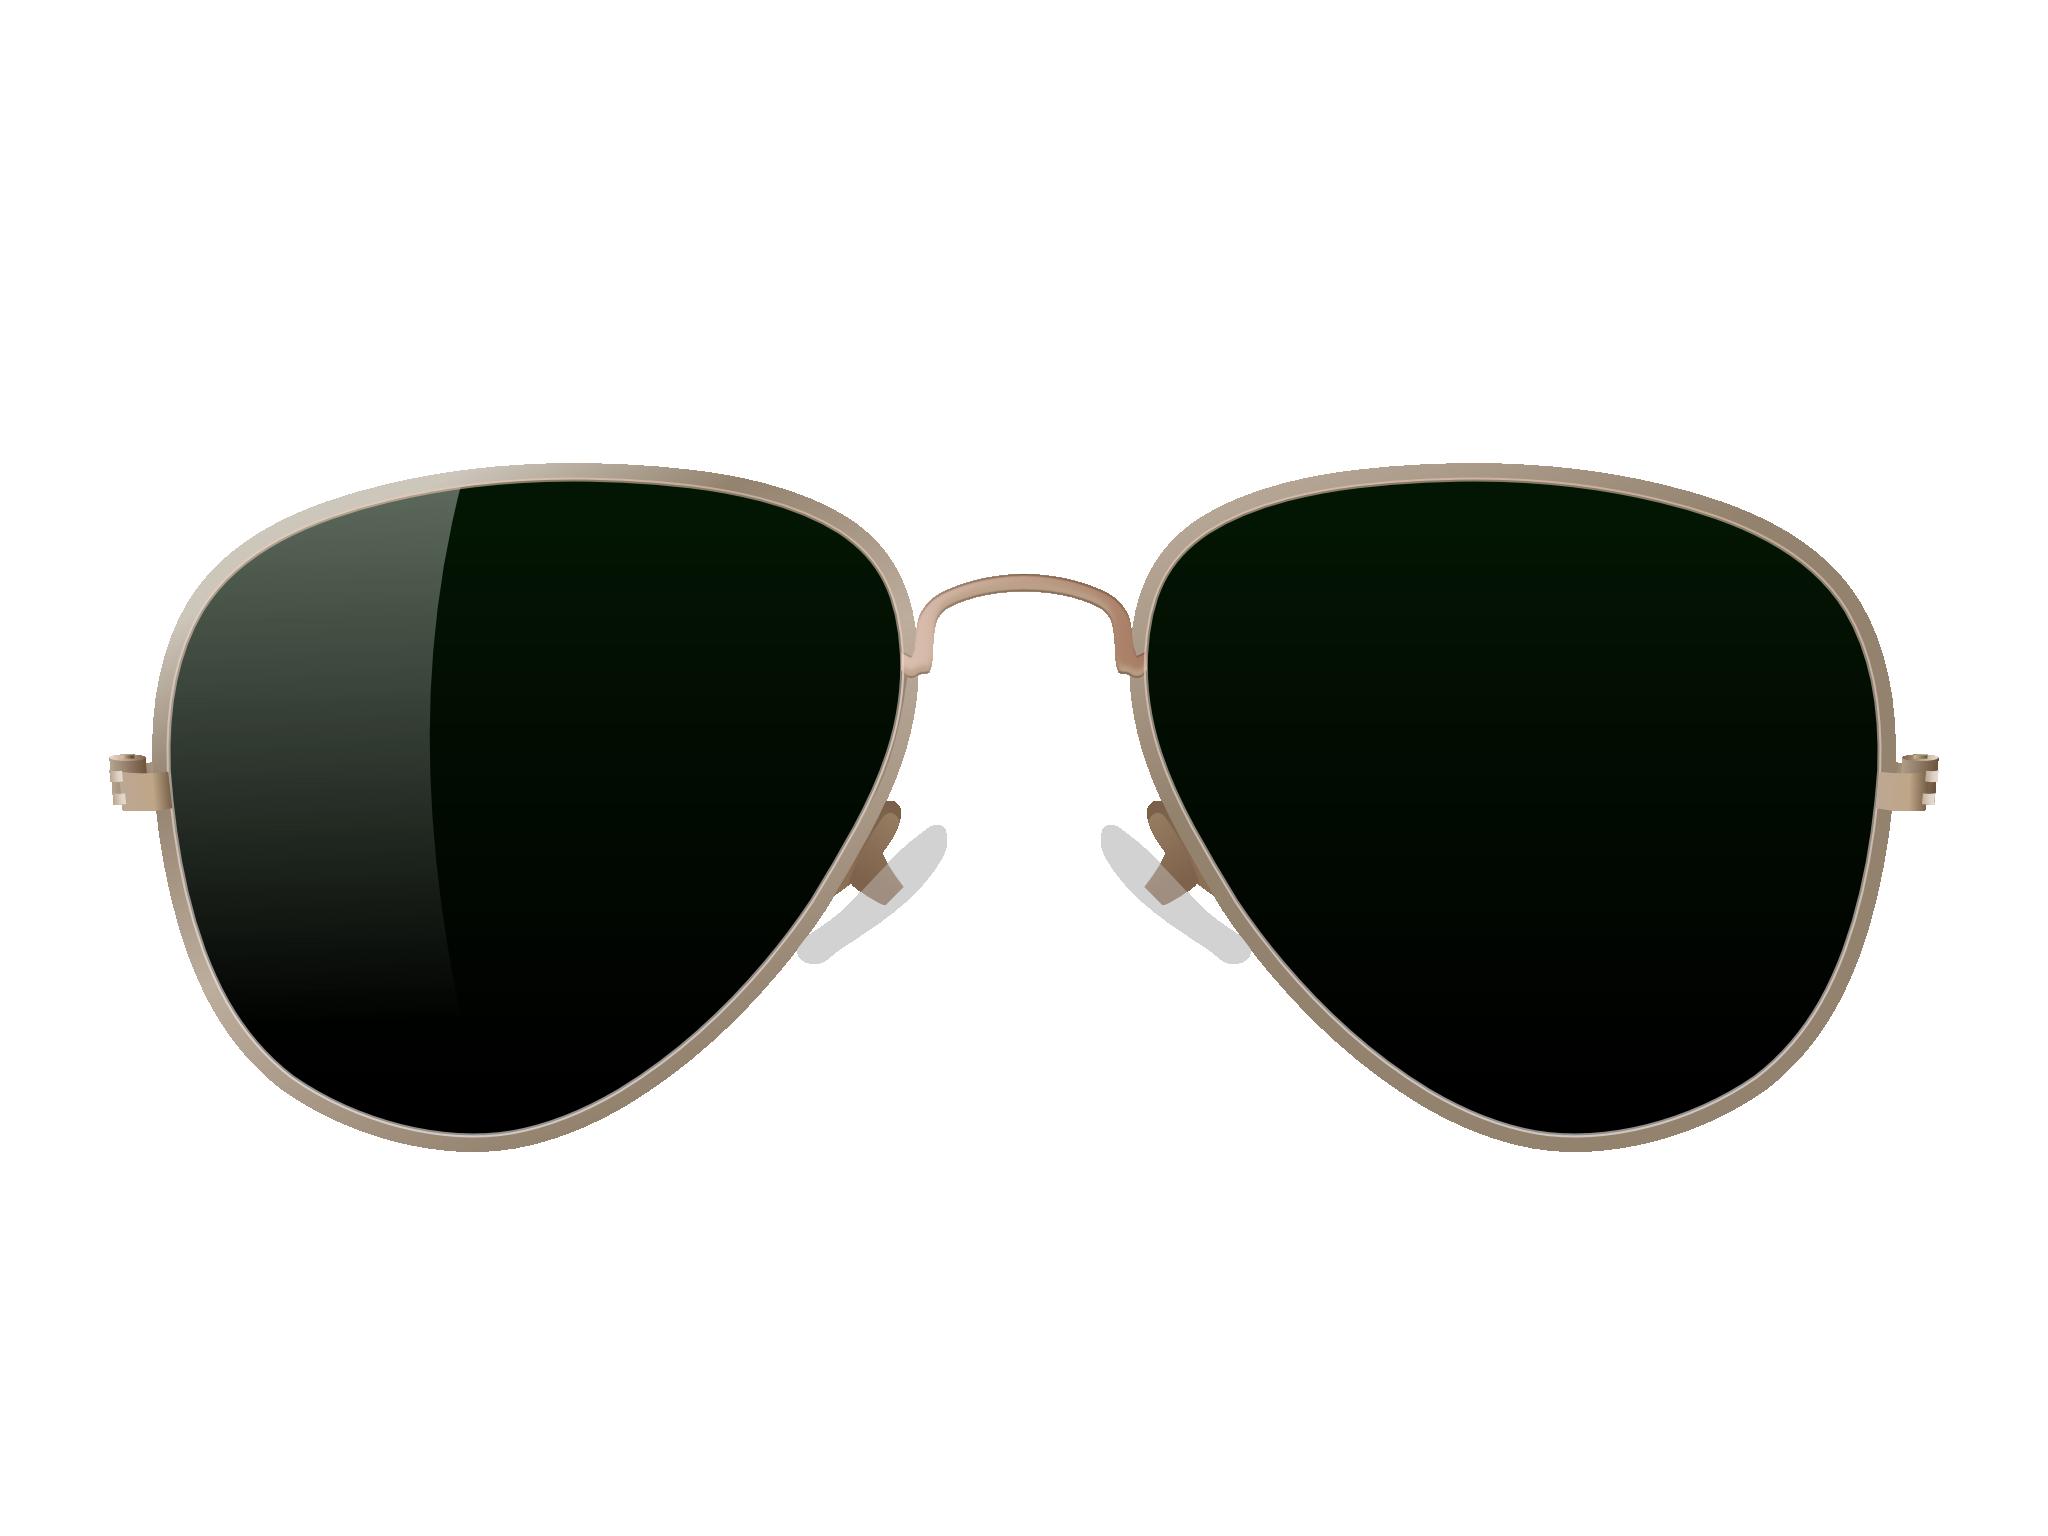 HQ Sunglasses PNG Transparent Sunglasses.PNG Images..